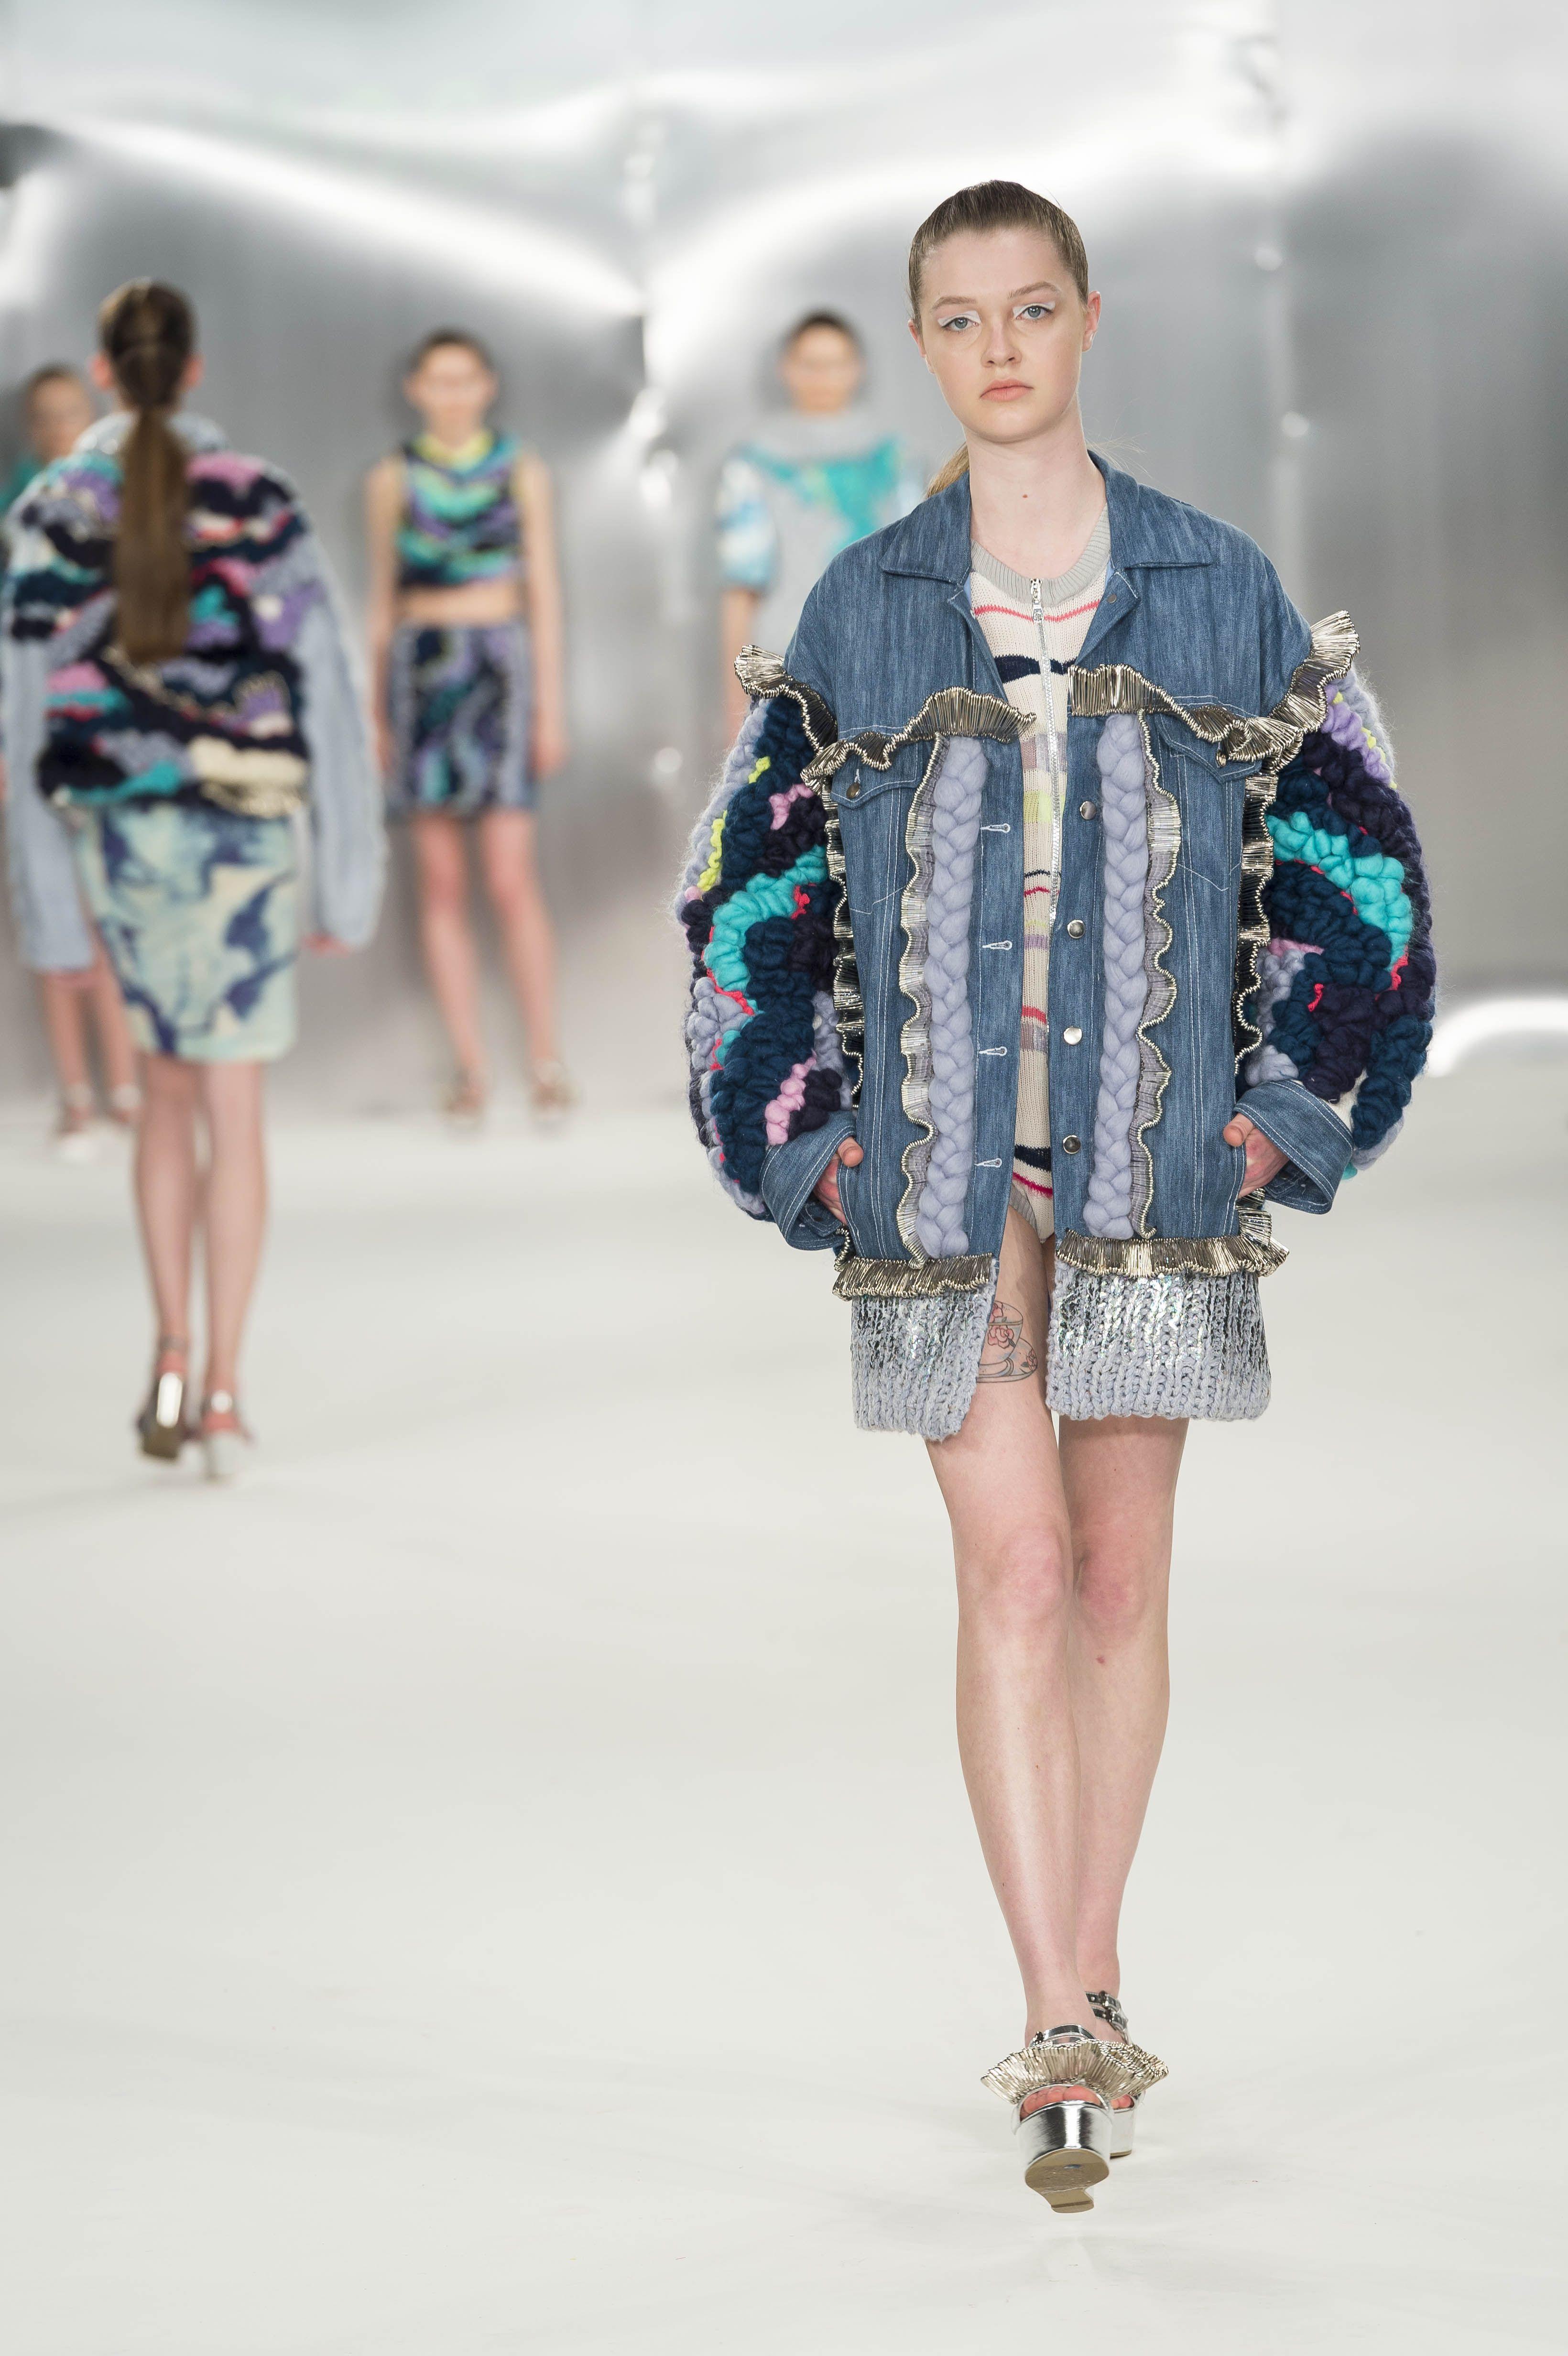 Design By De Montfort University Dmu Fashion Design Student Imogen Abbot On The Catwalk At Graduate Fashio Colorful Fashion Textiles Fashion Textures Fashion